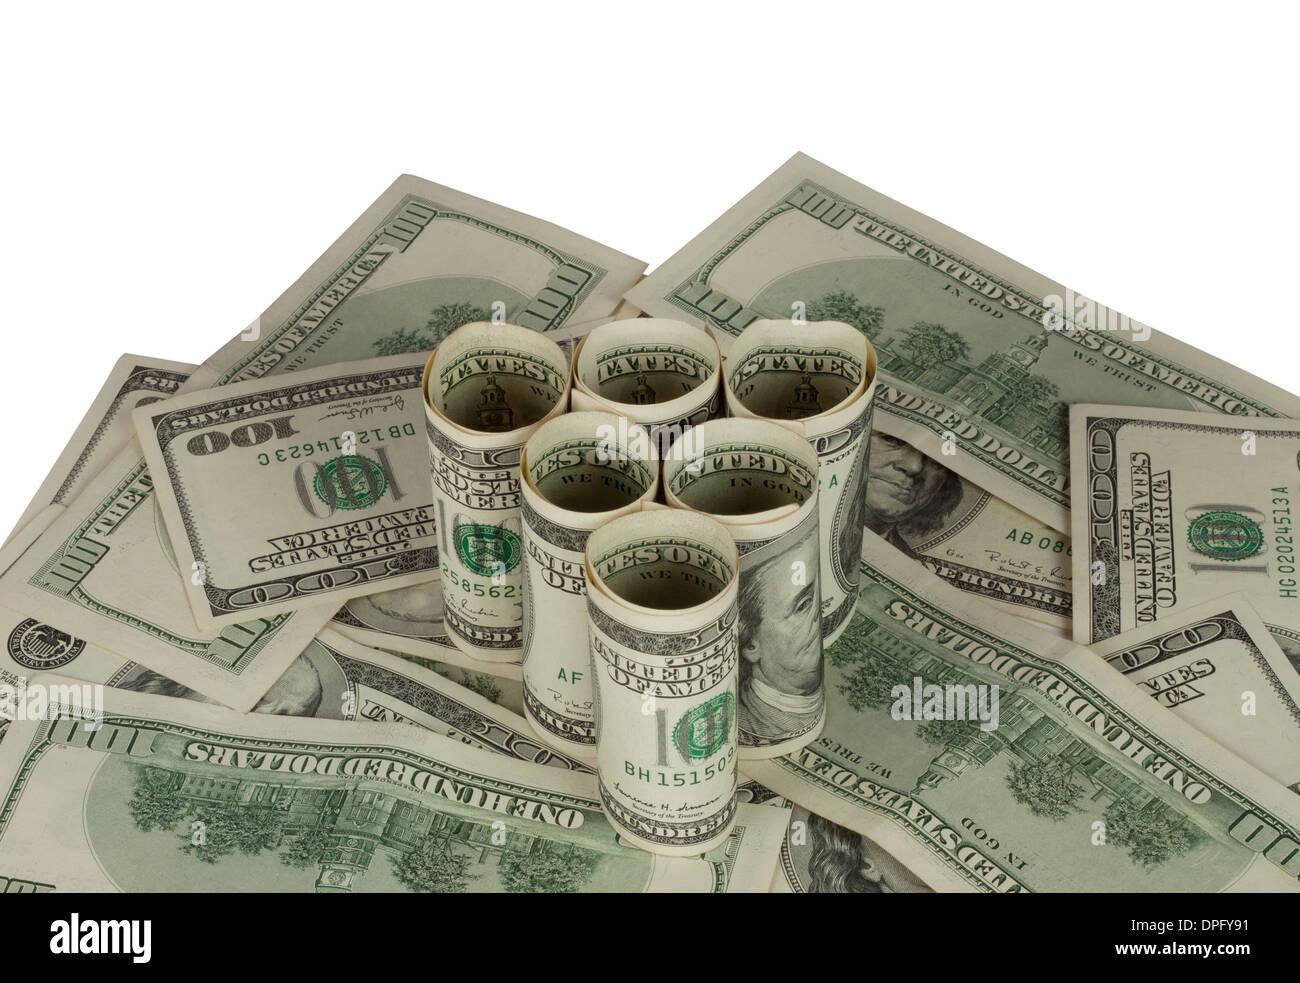 Triangle of hundred dollar bills on white background - Stock Image